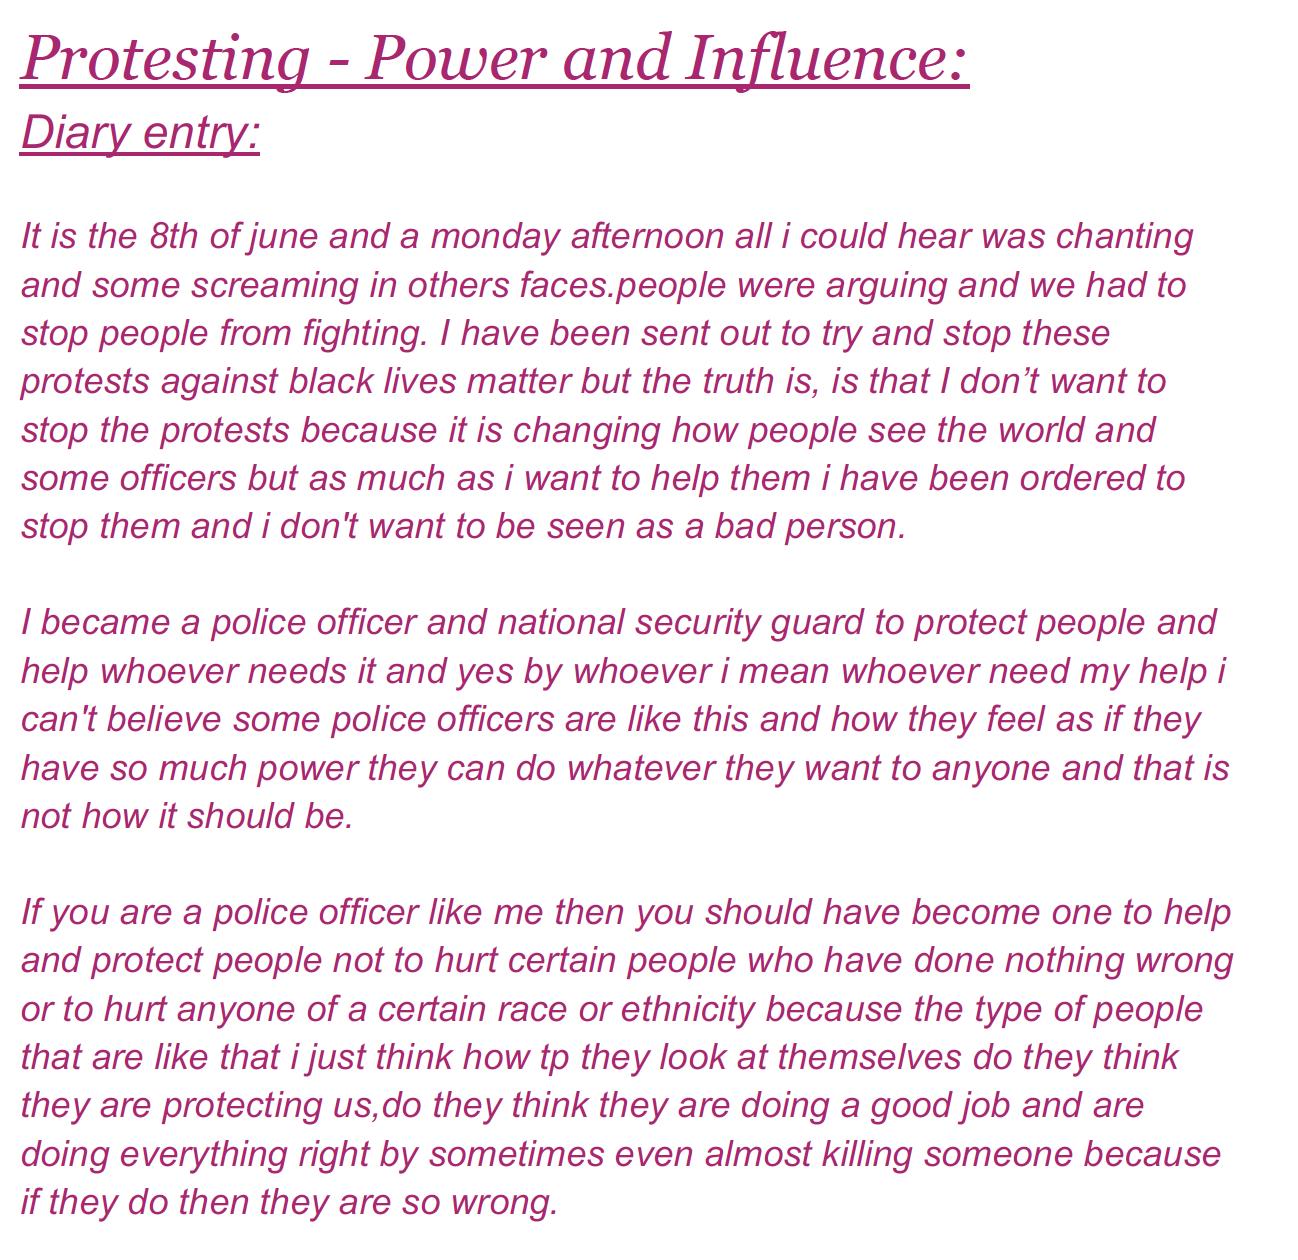 18/06/20 - Power & Influence